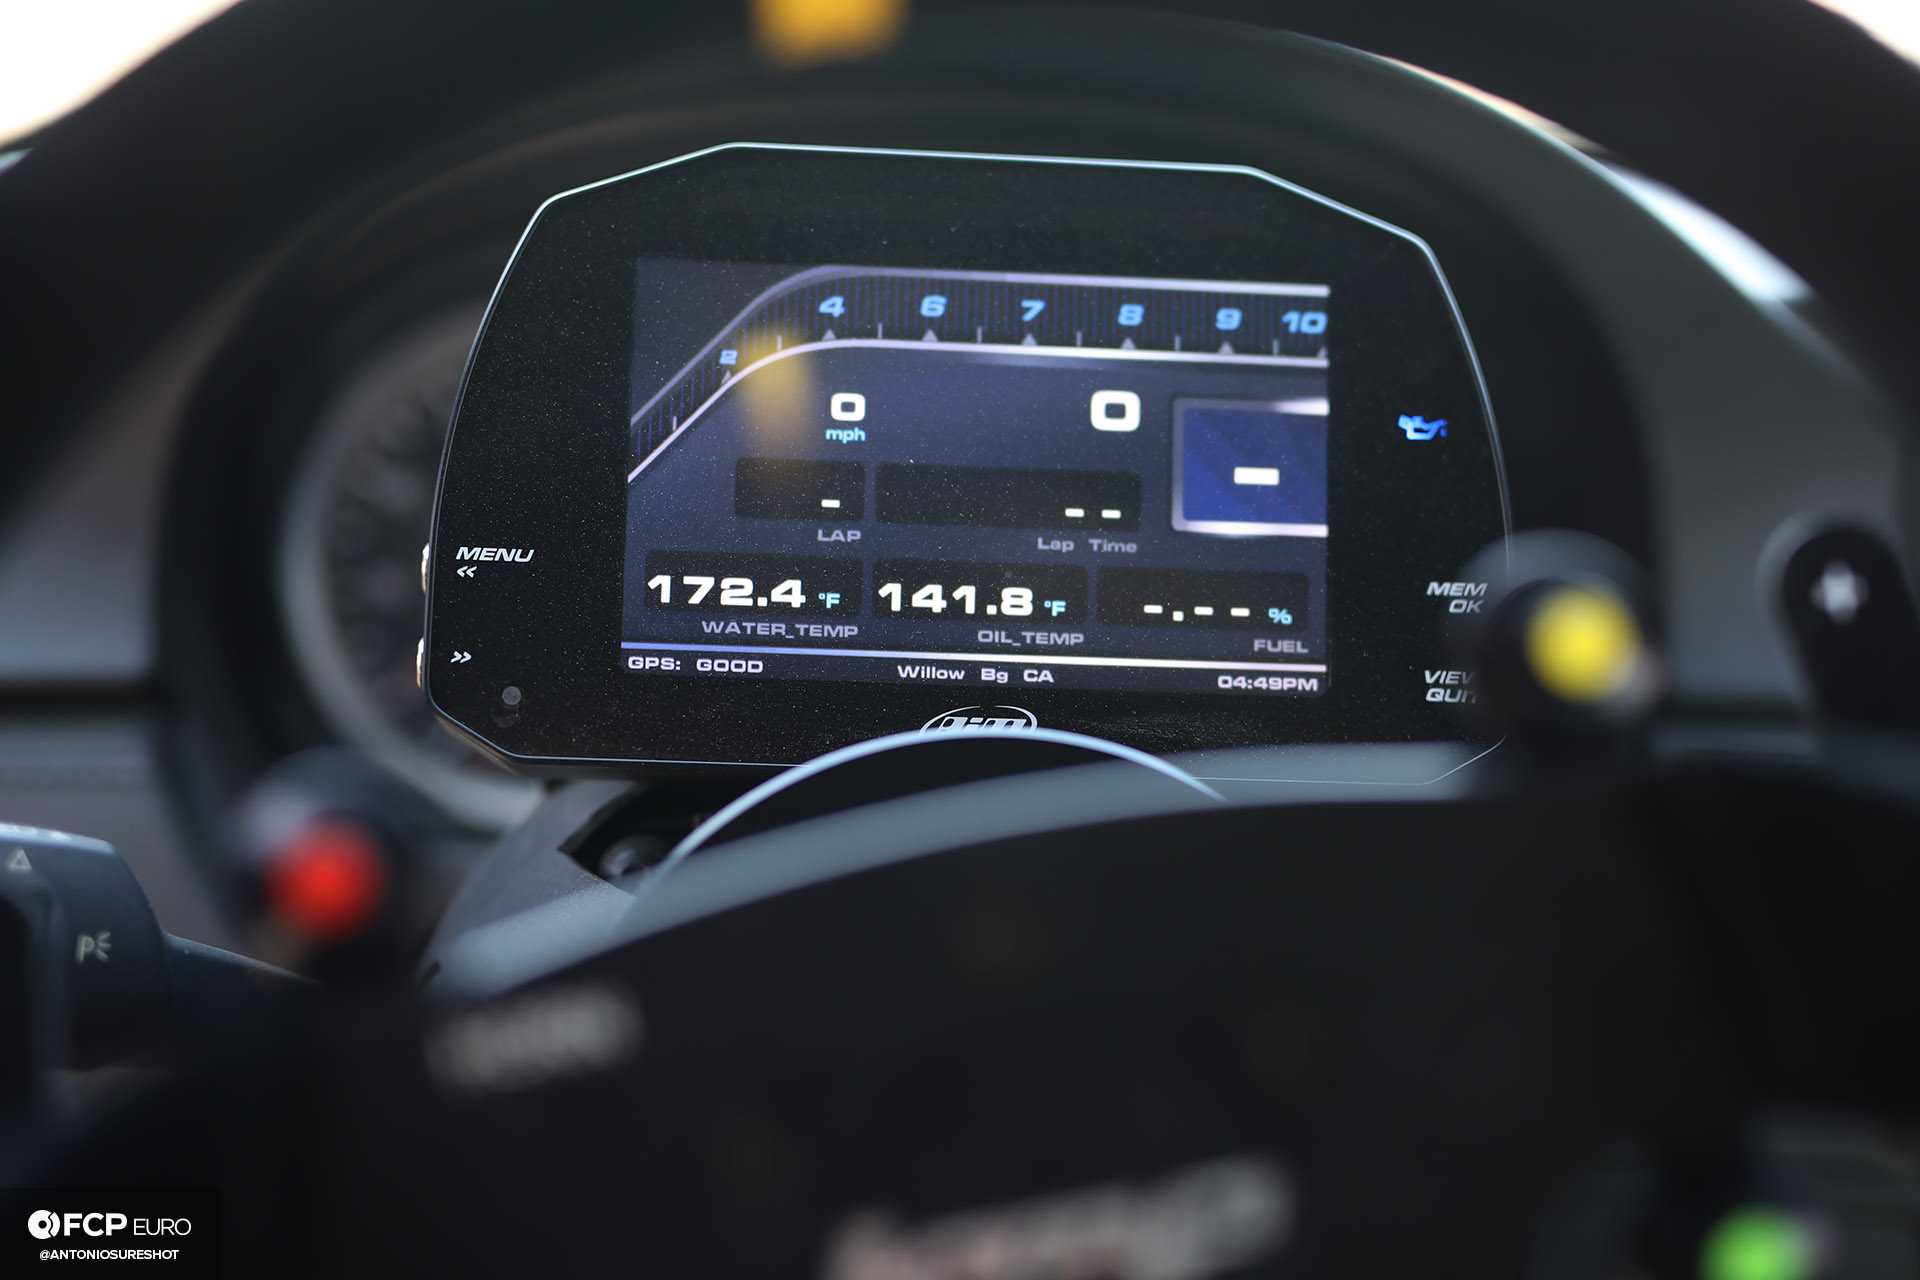 Bimmer Challenge BMW E92 M3 Aim Sports Digital Dashboard Motec FCP Euro